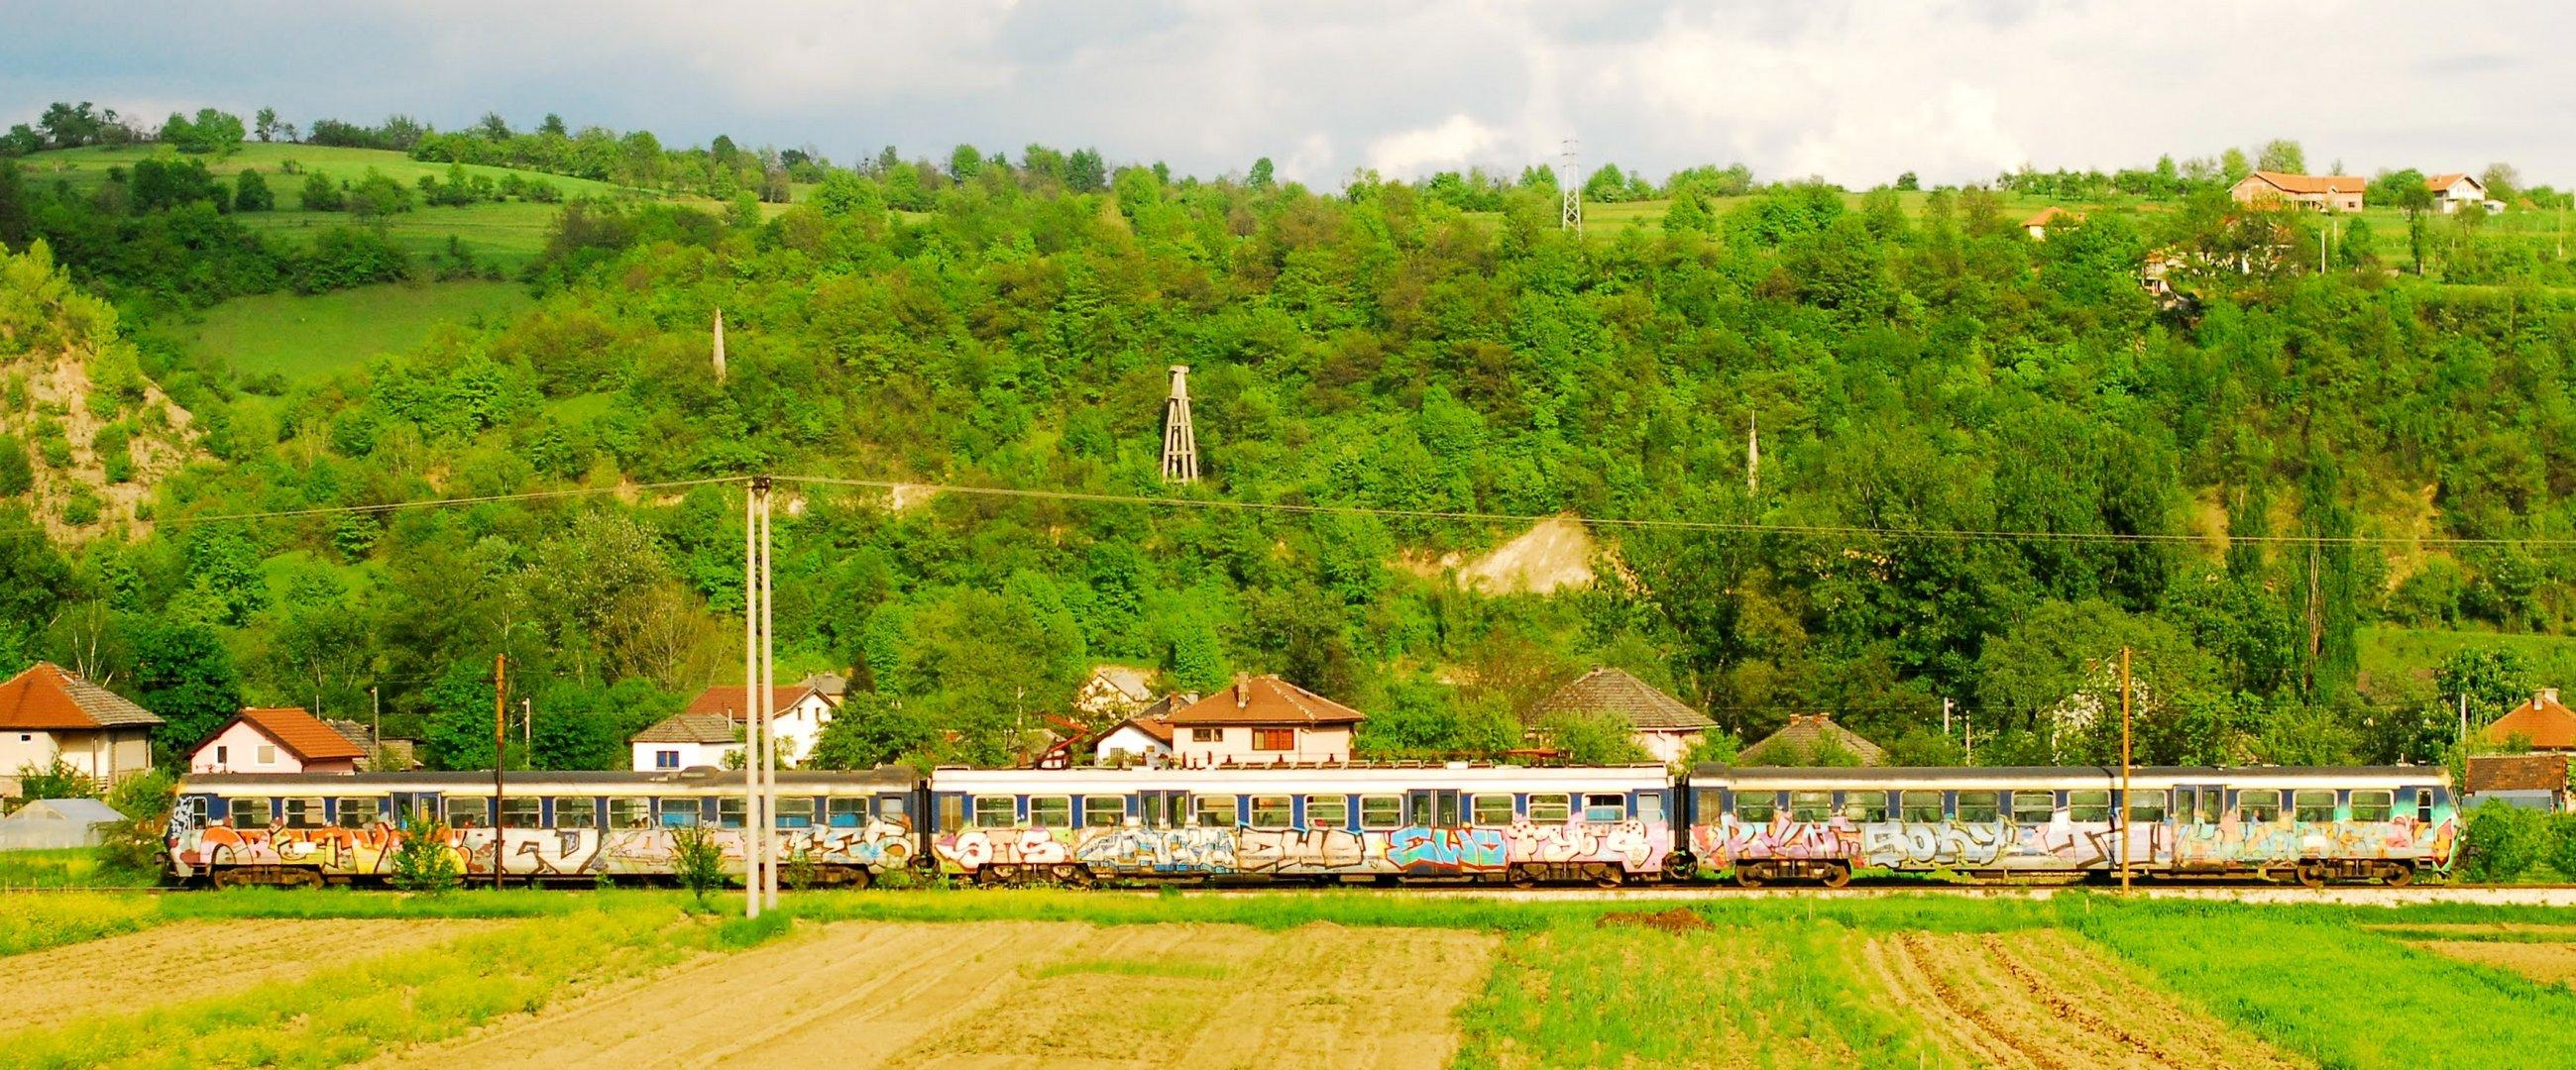 Graffiti-Train